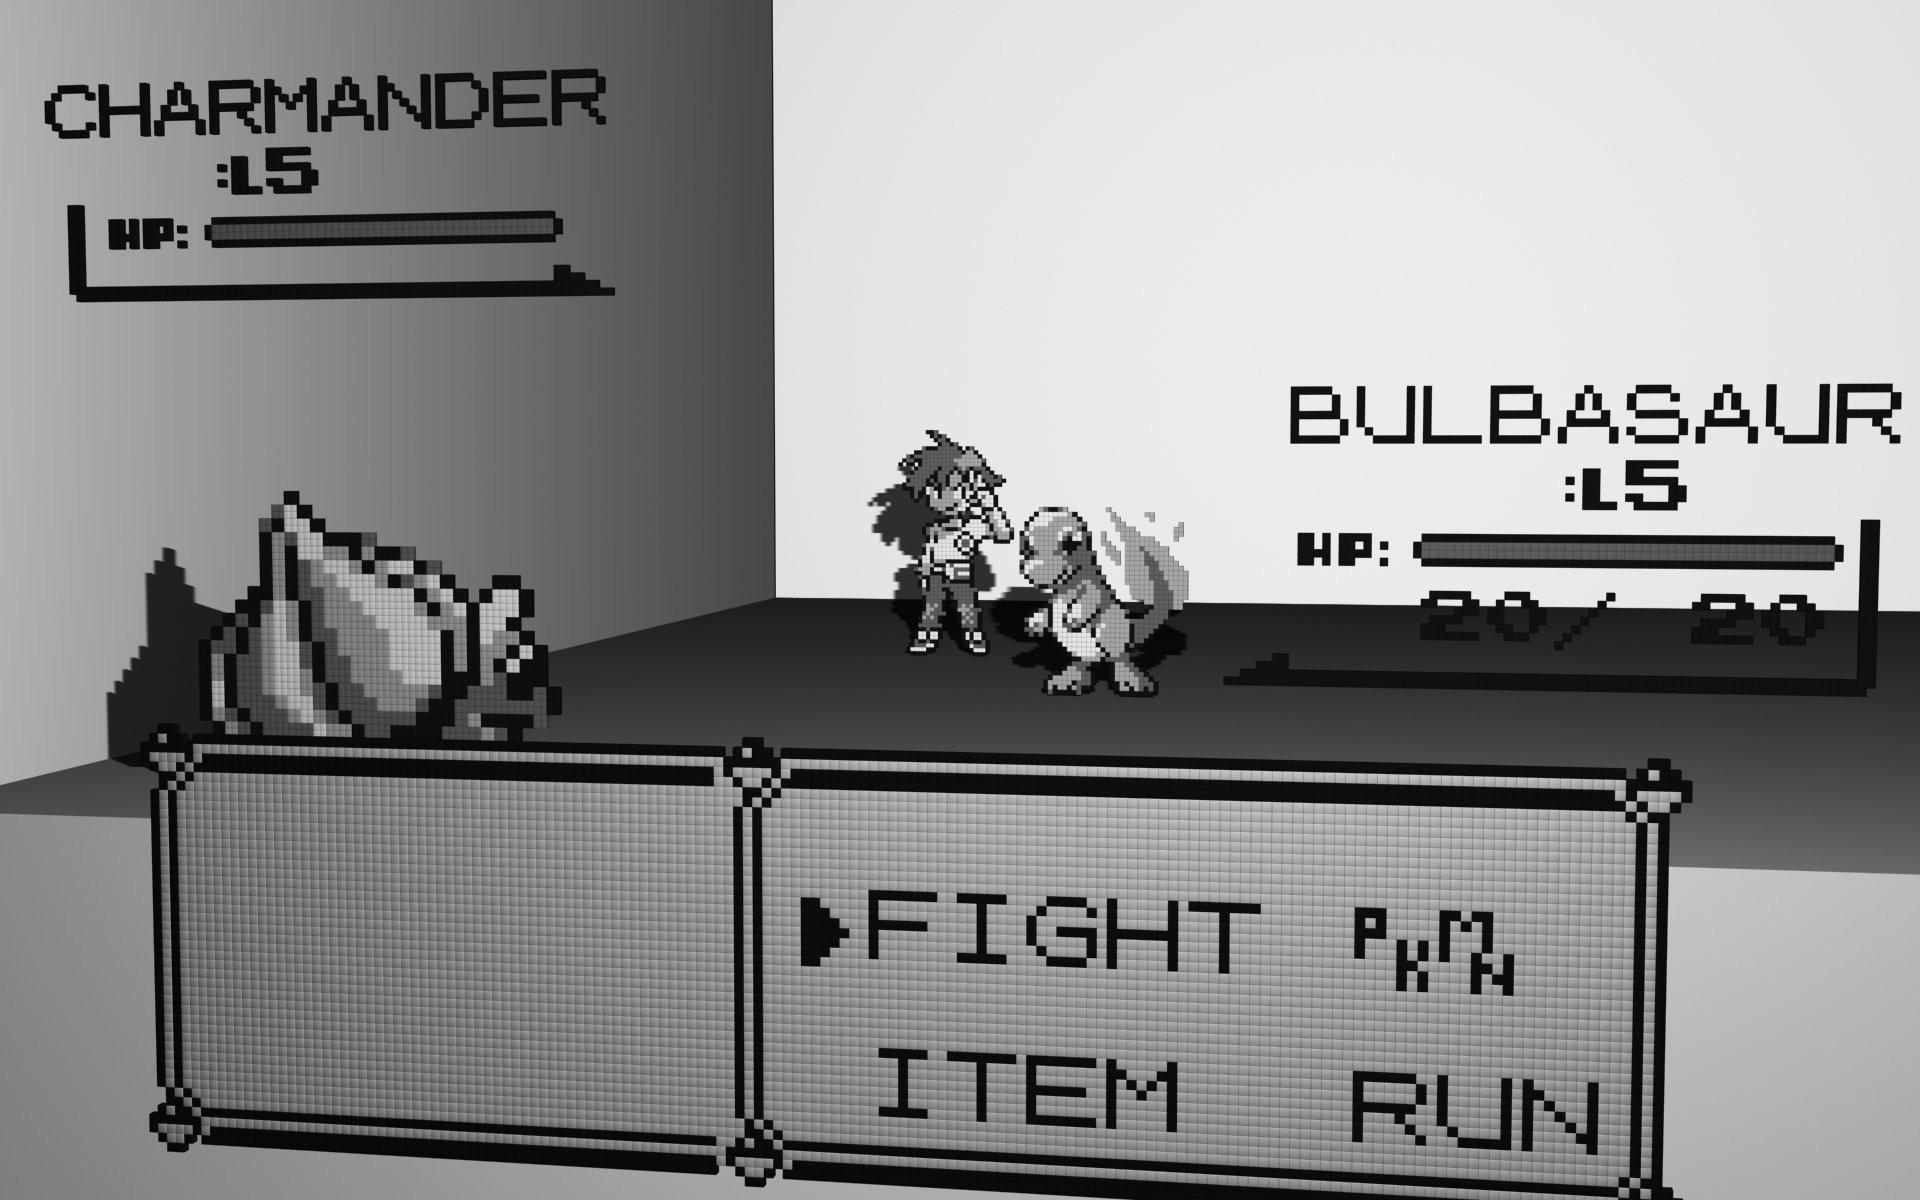 Video Game РPok̩mon Bulbasaur (Pok̩mon) Charmander (Pok̩mon) Wallpaper